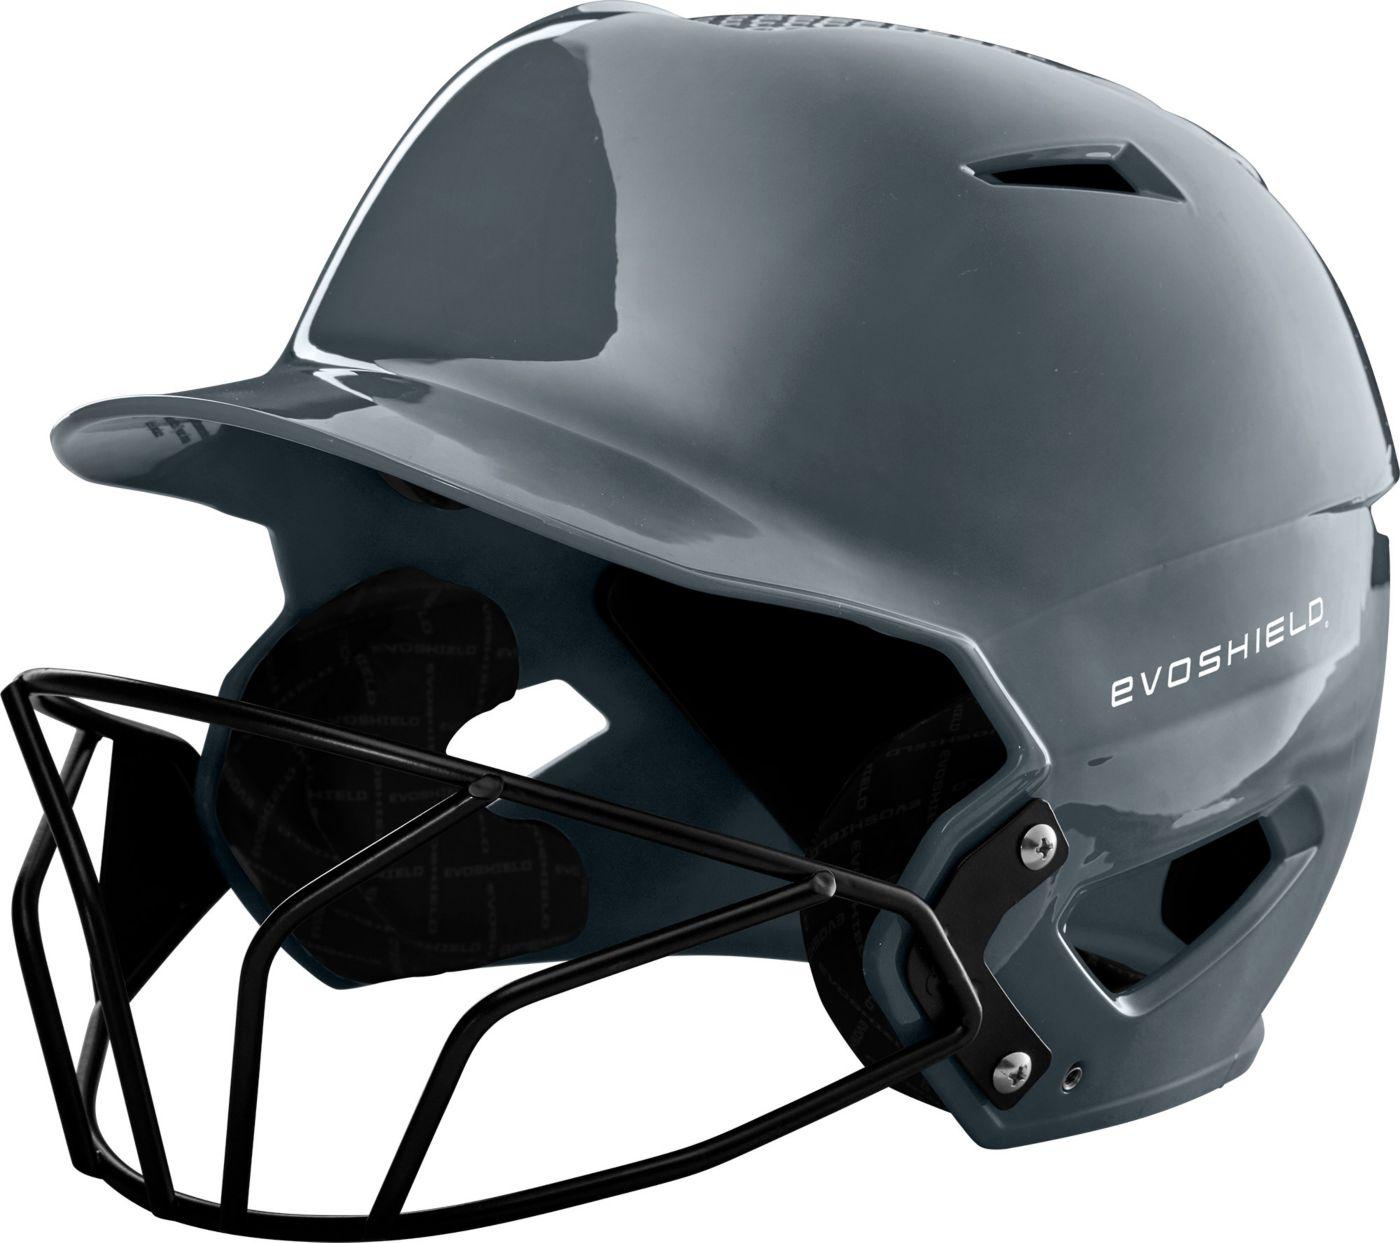 EvoShield Girls' XVT Batting Helmet w/ Softball Mask 2020